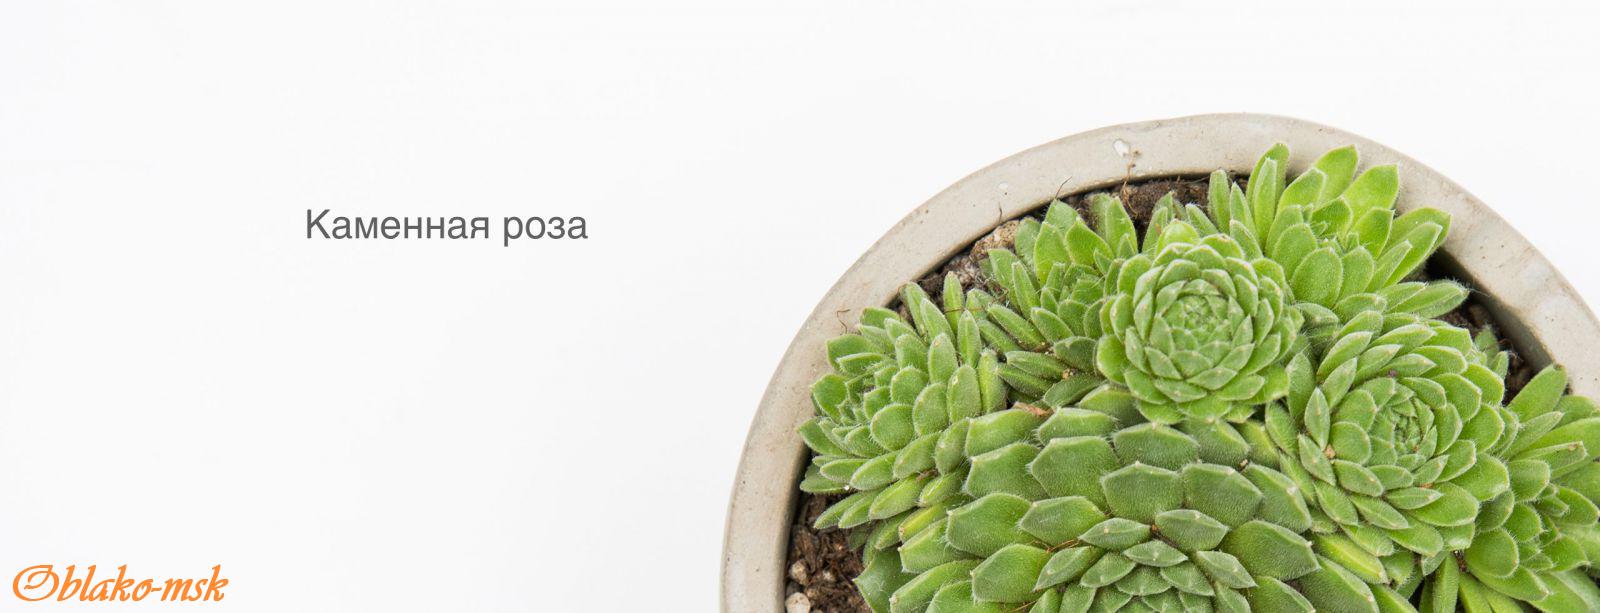 Xiaomi Smart Flower Monitor